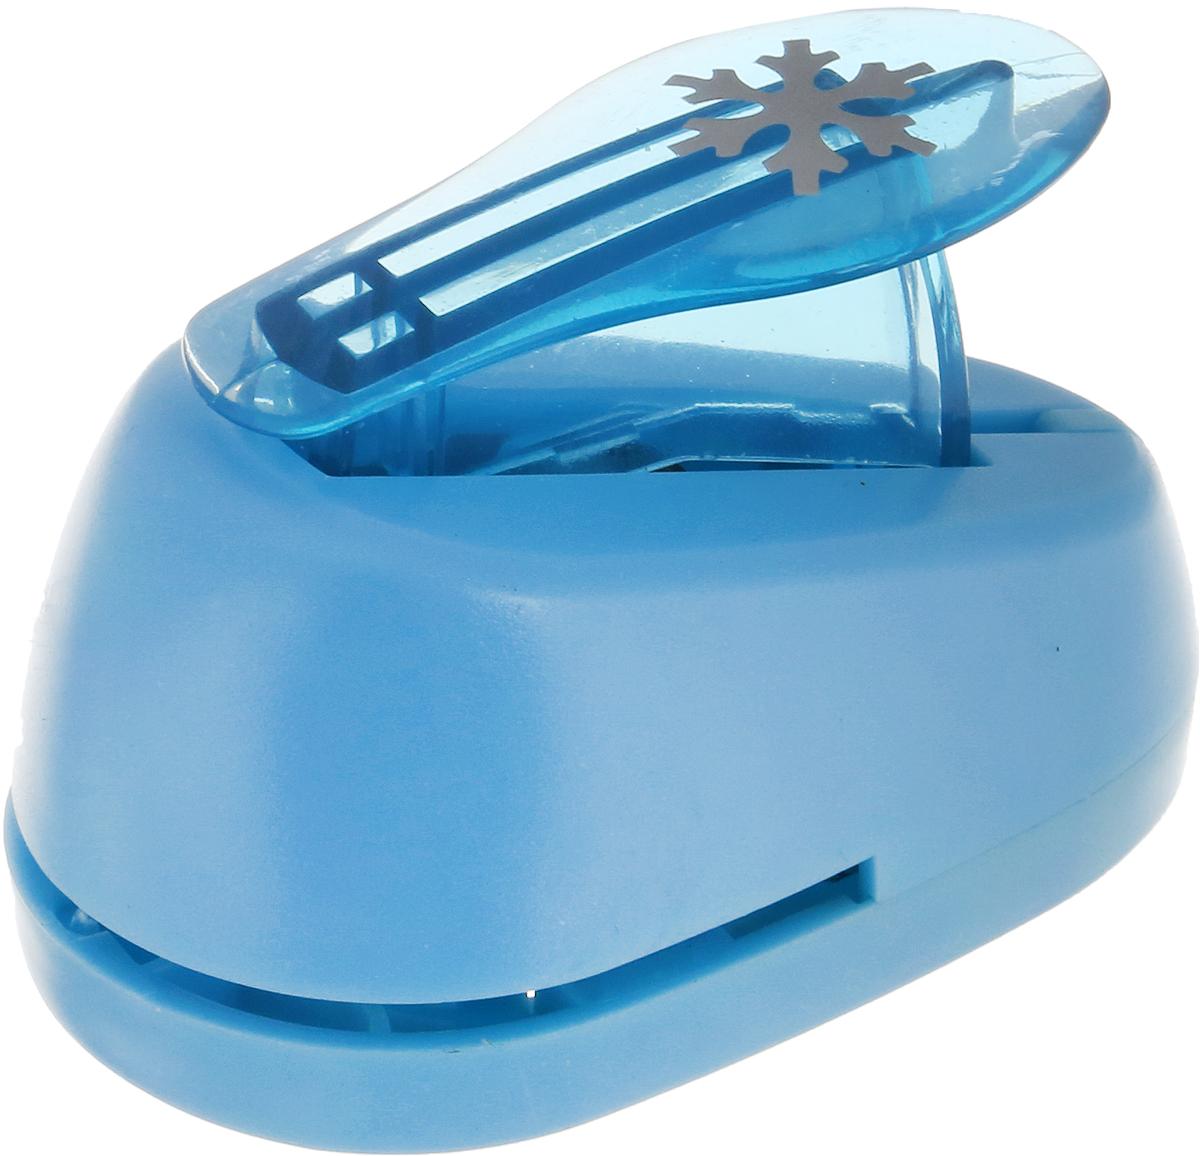 "Дырокол фигурный Hobbyboom ""Снежинка"", №350, цвет: голубой, 1,8 см"